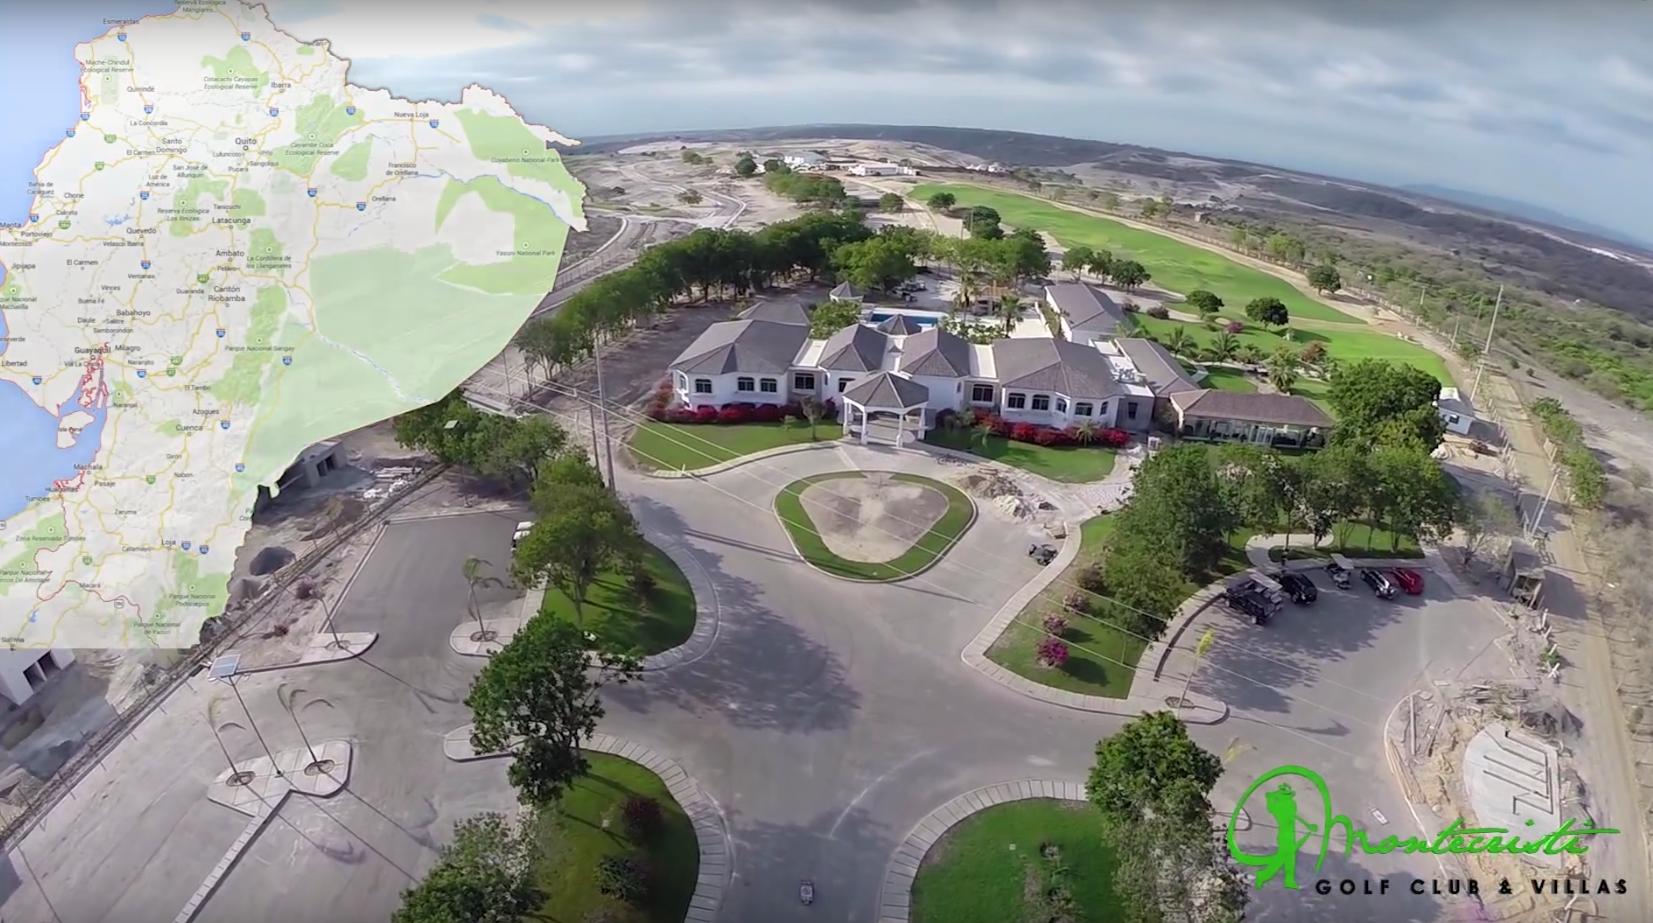 Montecristi Golf Club & Villas